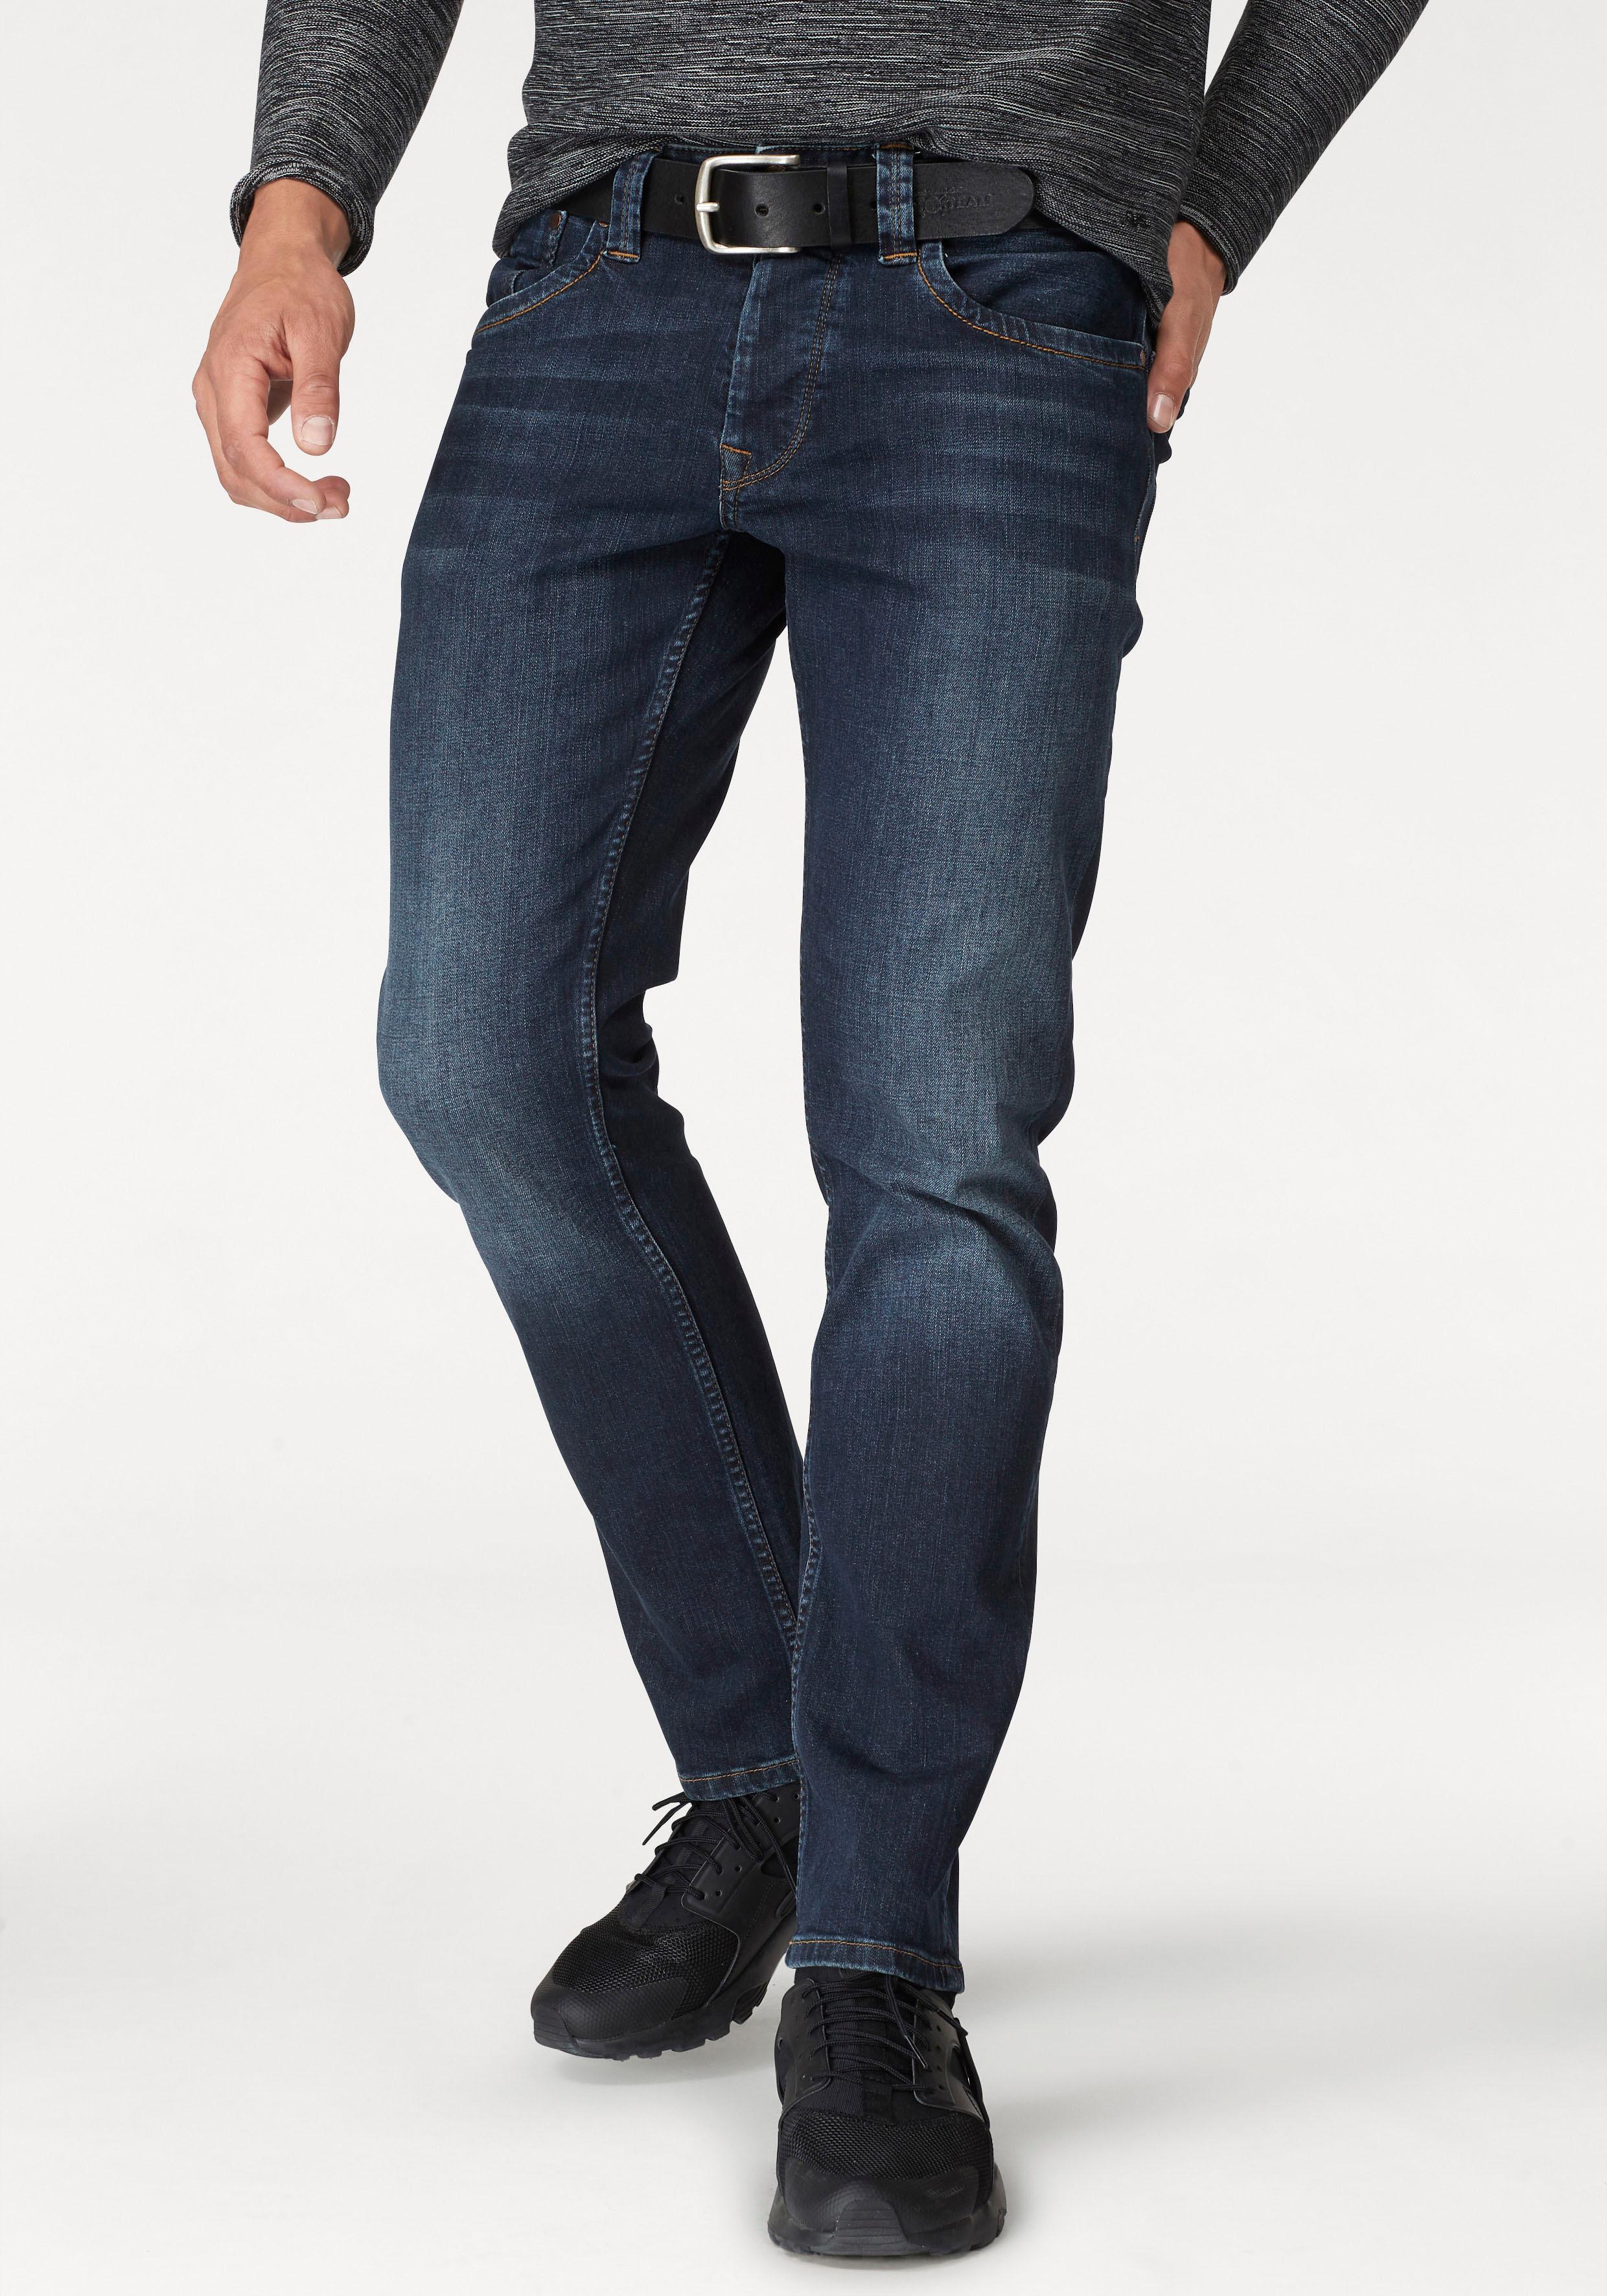 Pepe Jeans Regular-fit-Jeans CASH   Bekleidung > Jeans > Sonstige Jeans   Blau   Jeans   Pepe Jeans